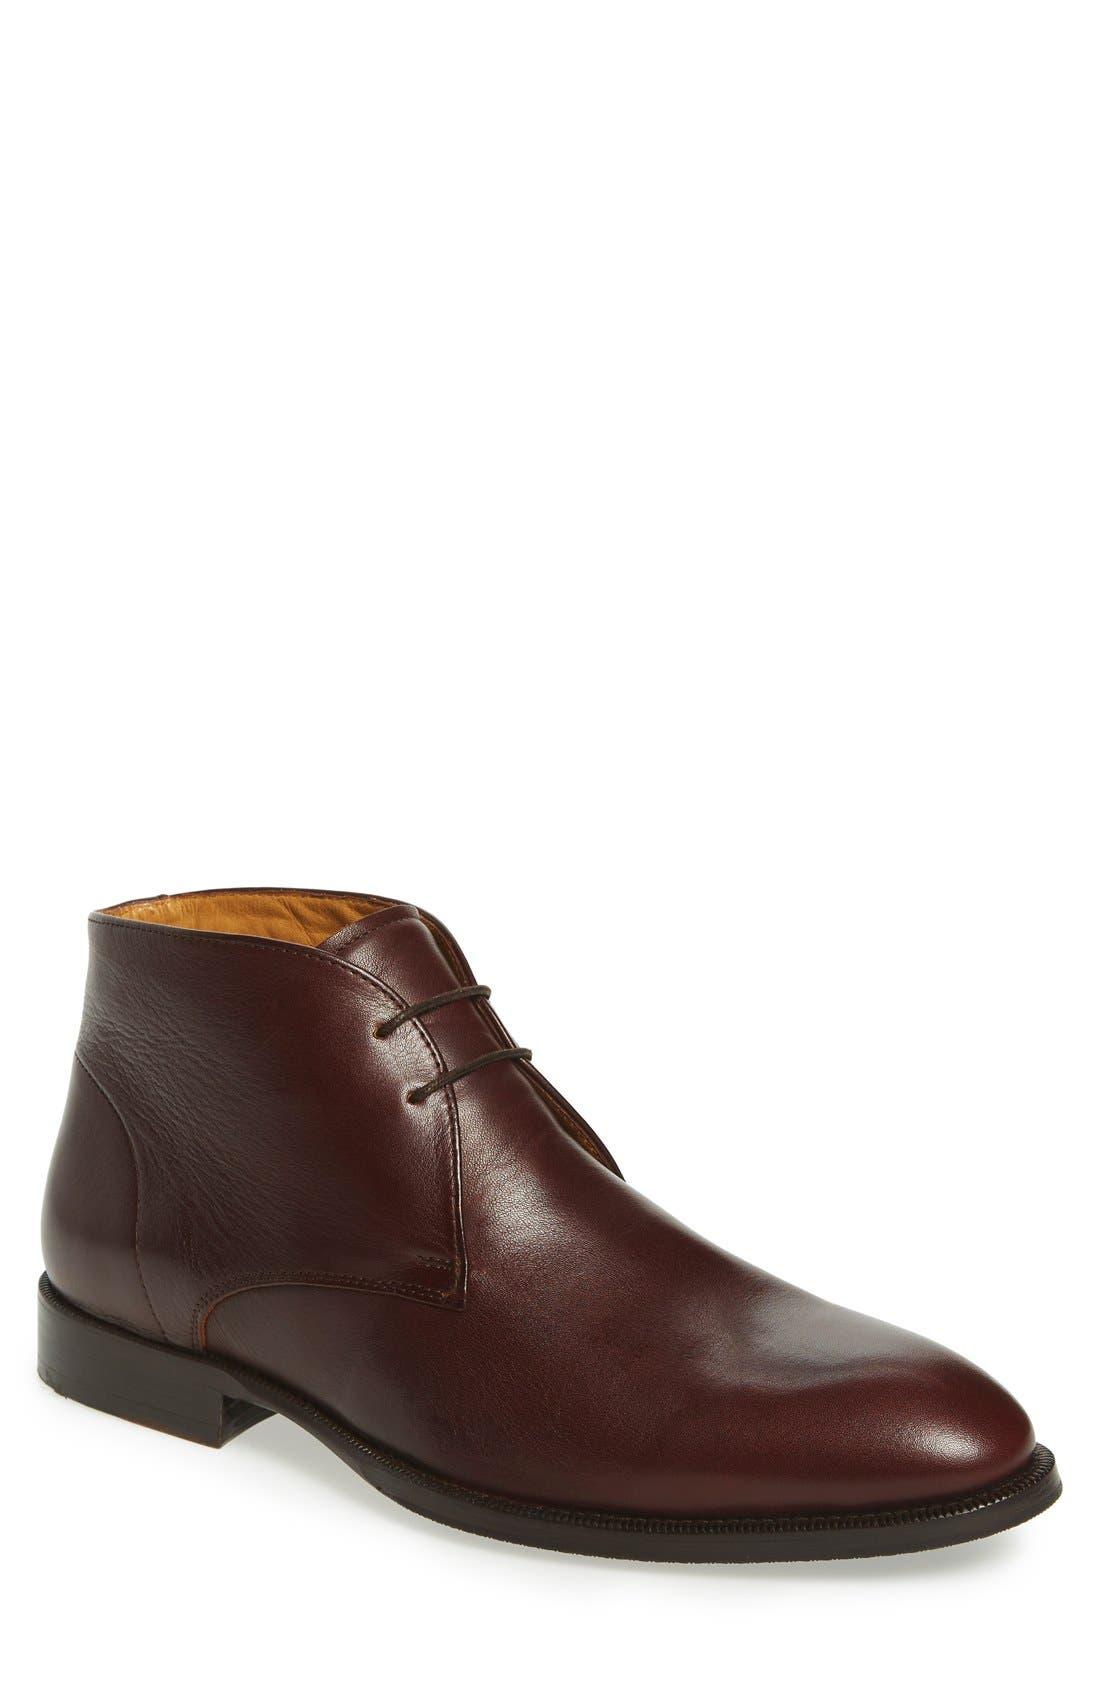 'Branx' Chukka Boot,                         Main,                         color, Dark Brown Leather